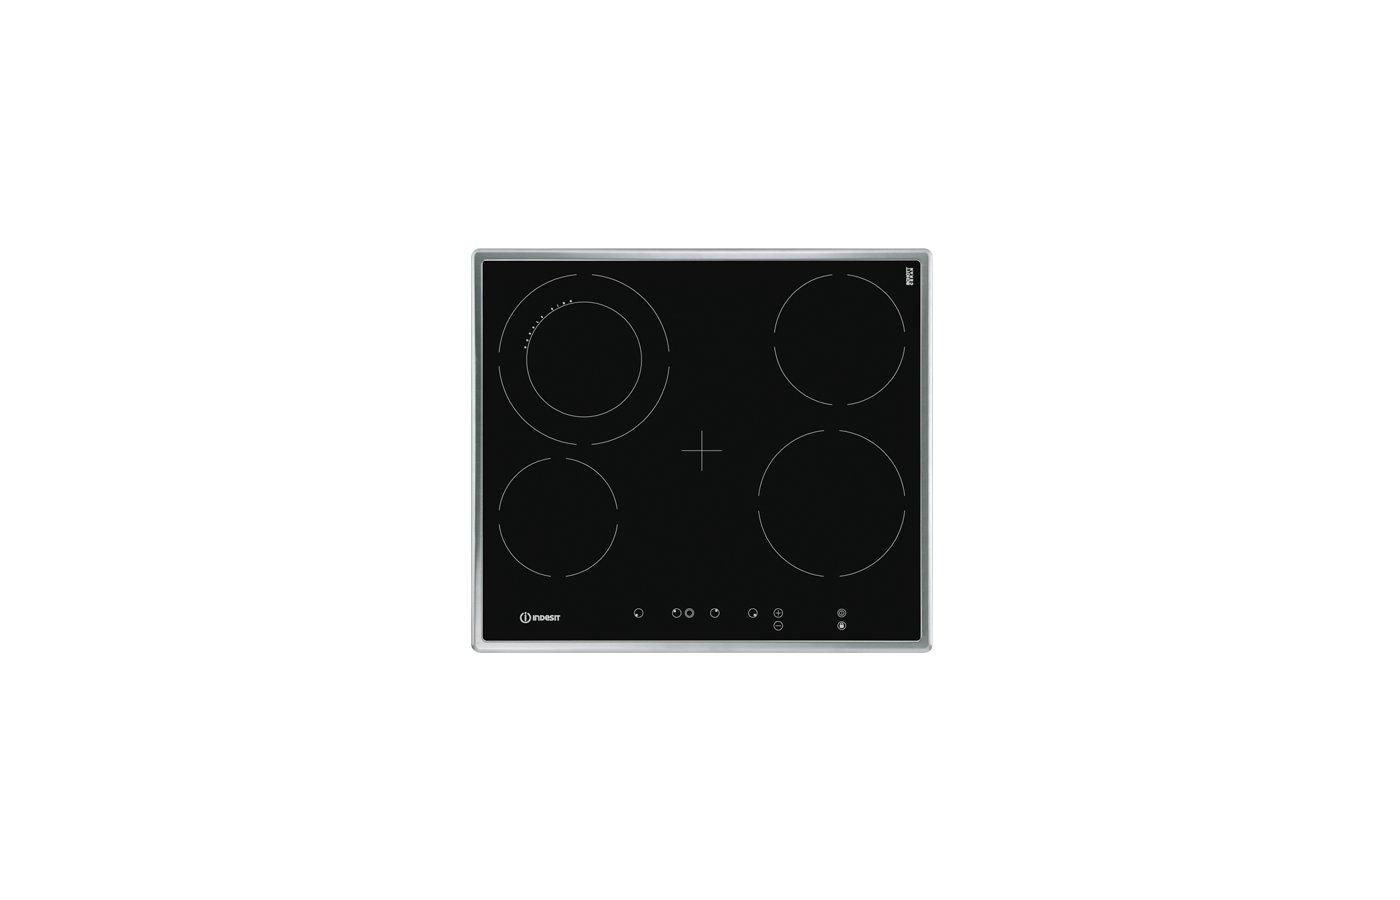 Варочная панель INDESIT VRA 641 D X S